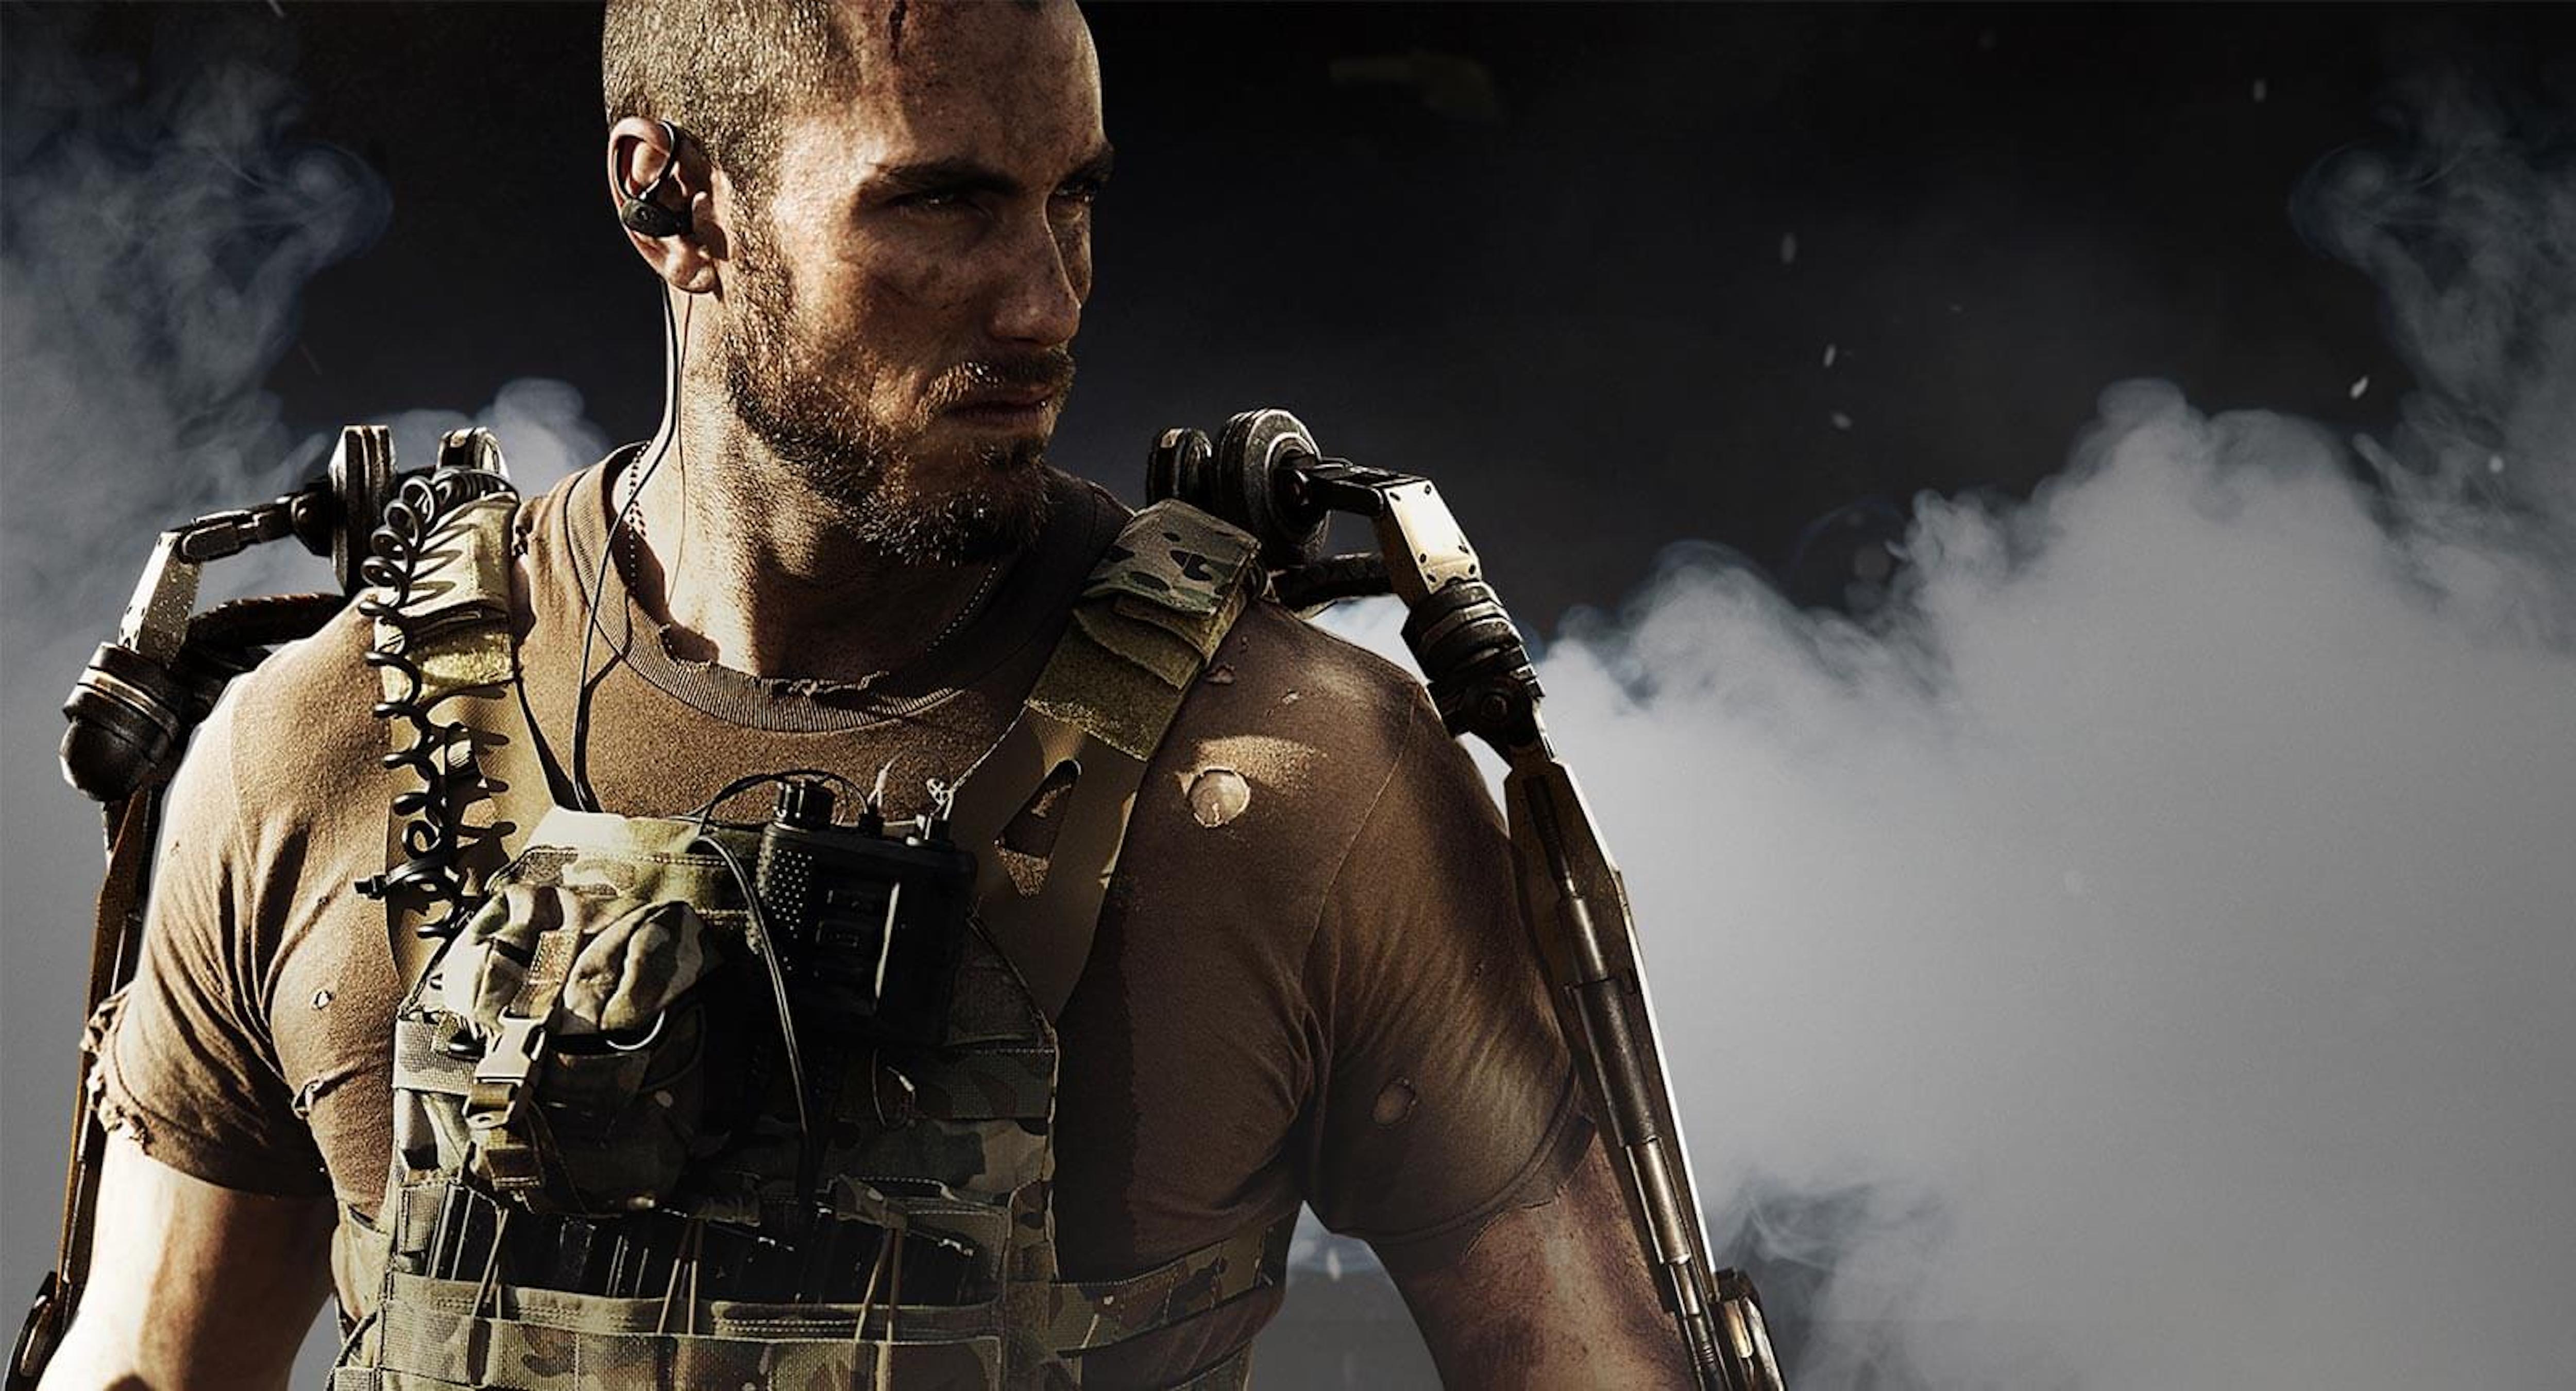 Gideon | Call of Duty: Heroes Wiki | FANDOM powered by Wikia